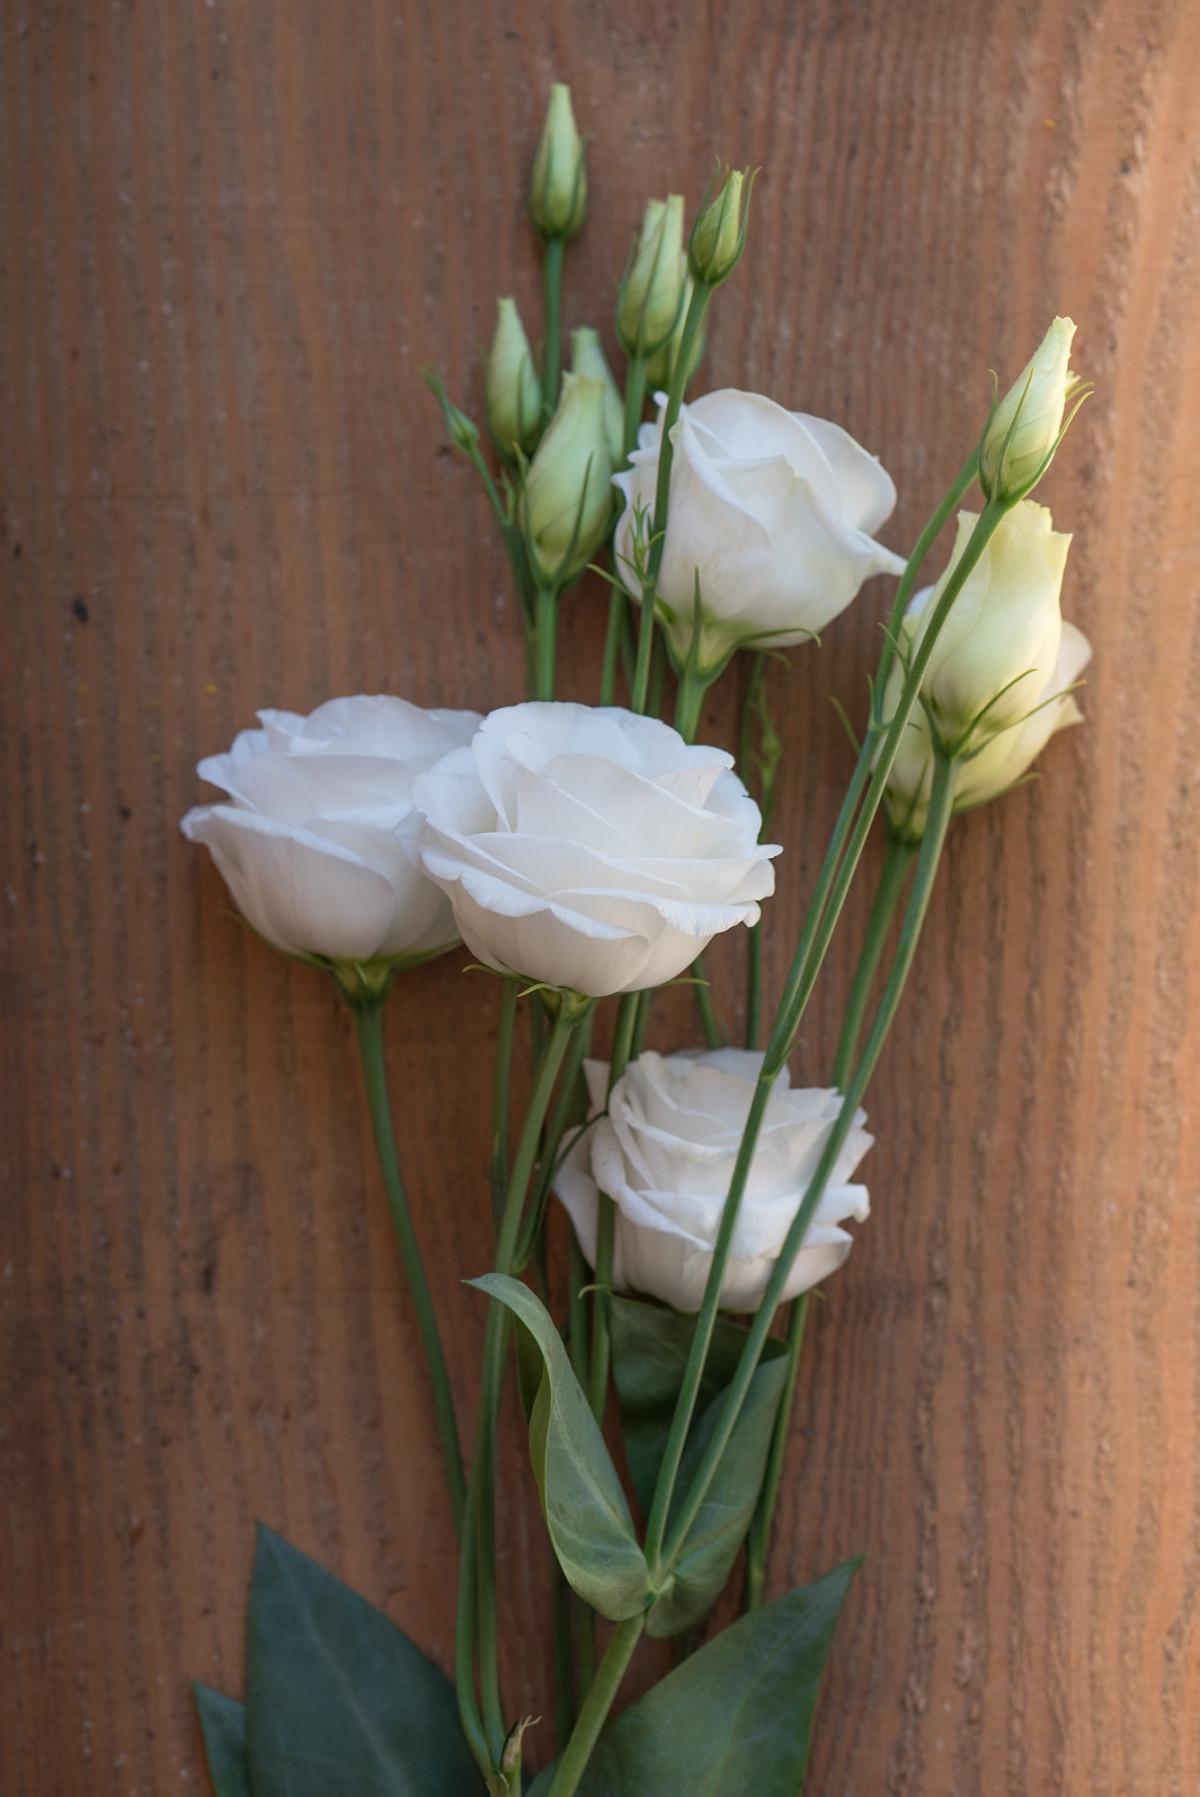 kostenlose foto bl hen holz wei s sonnenlicht bl tenblatt tulpe schlie en flora. Black Bedroom Furniture Sets. Home Design Ideas